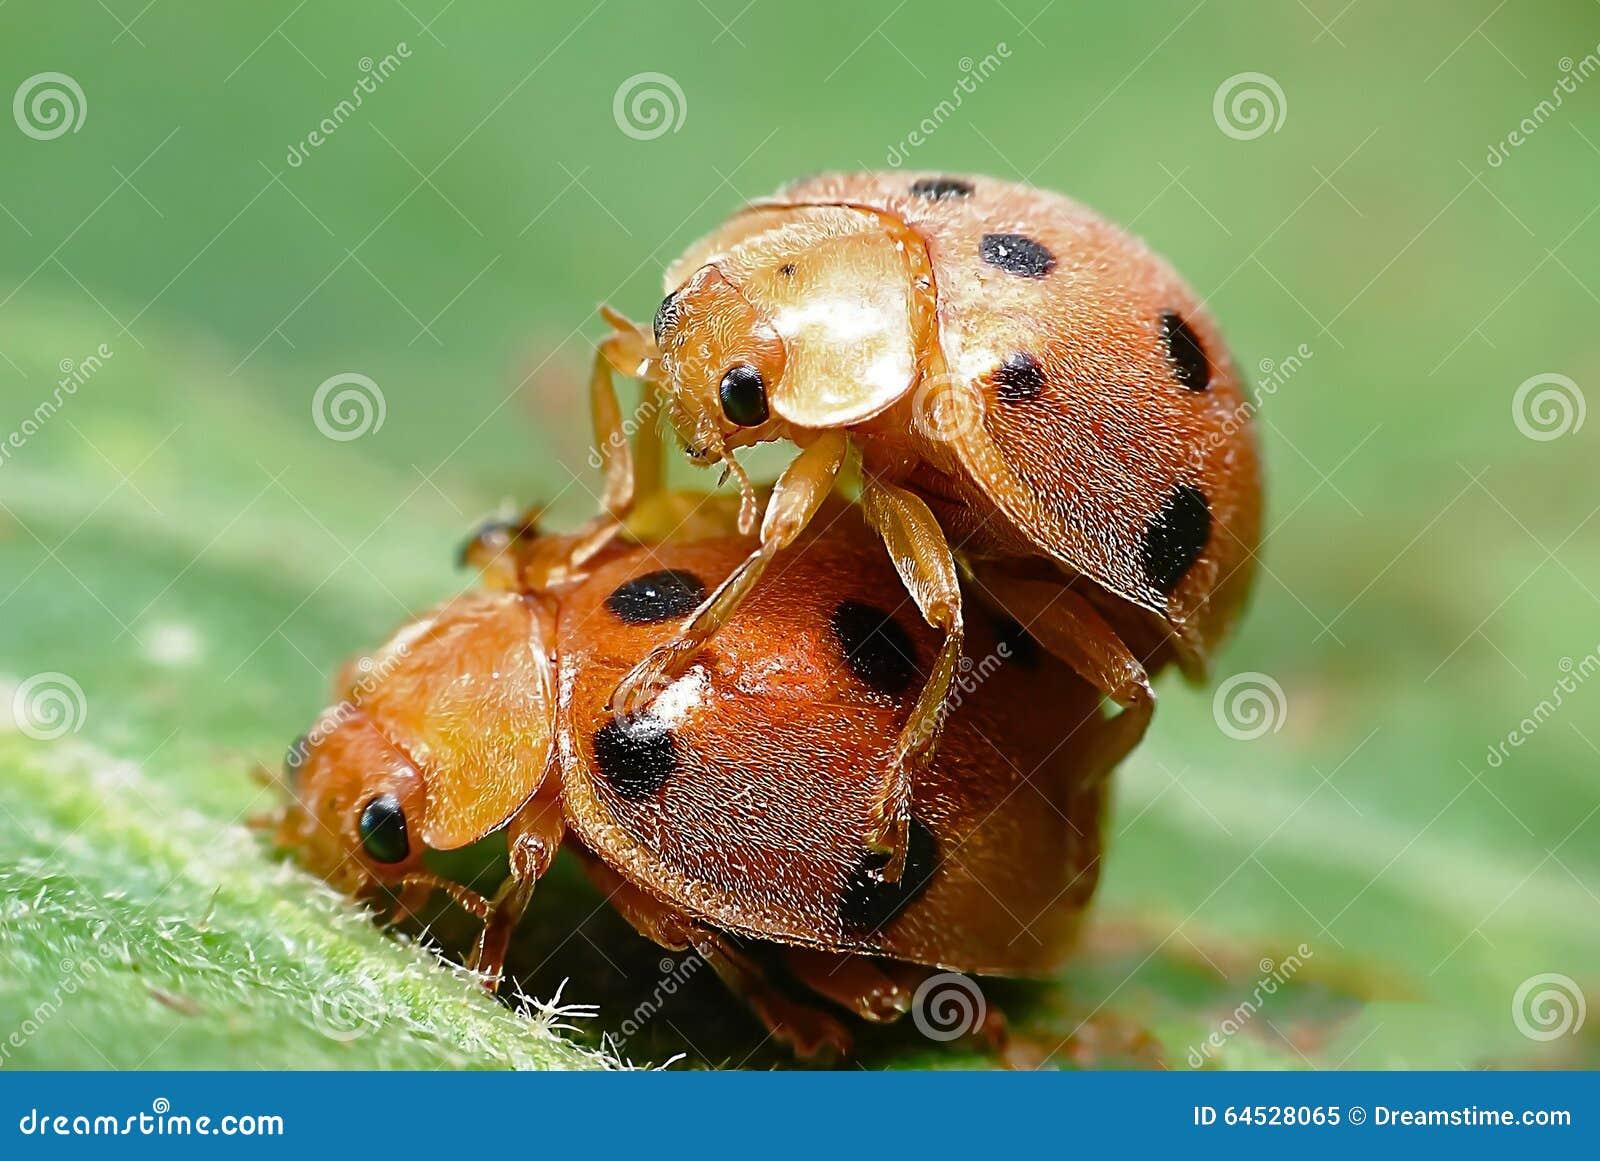 Insekten-Marienkäfer 2